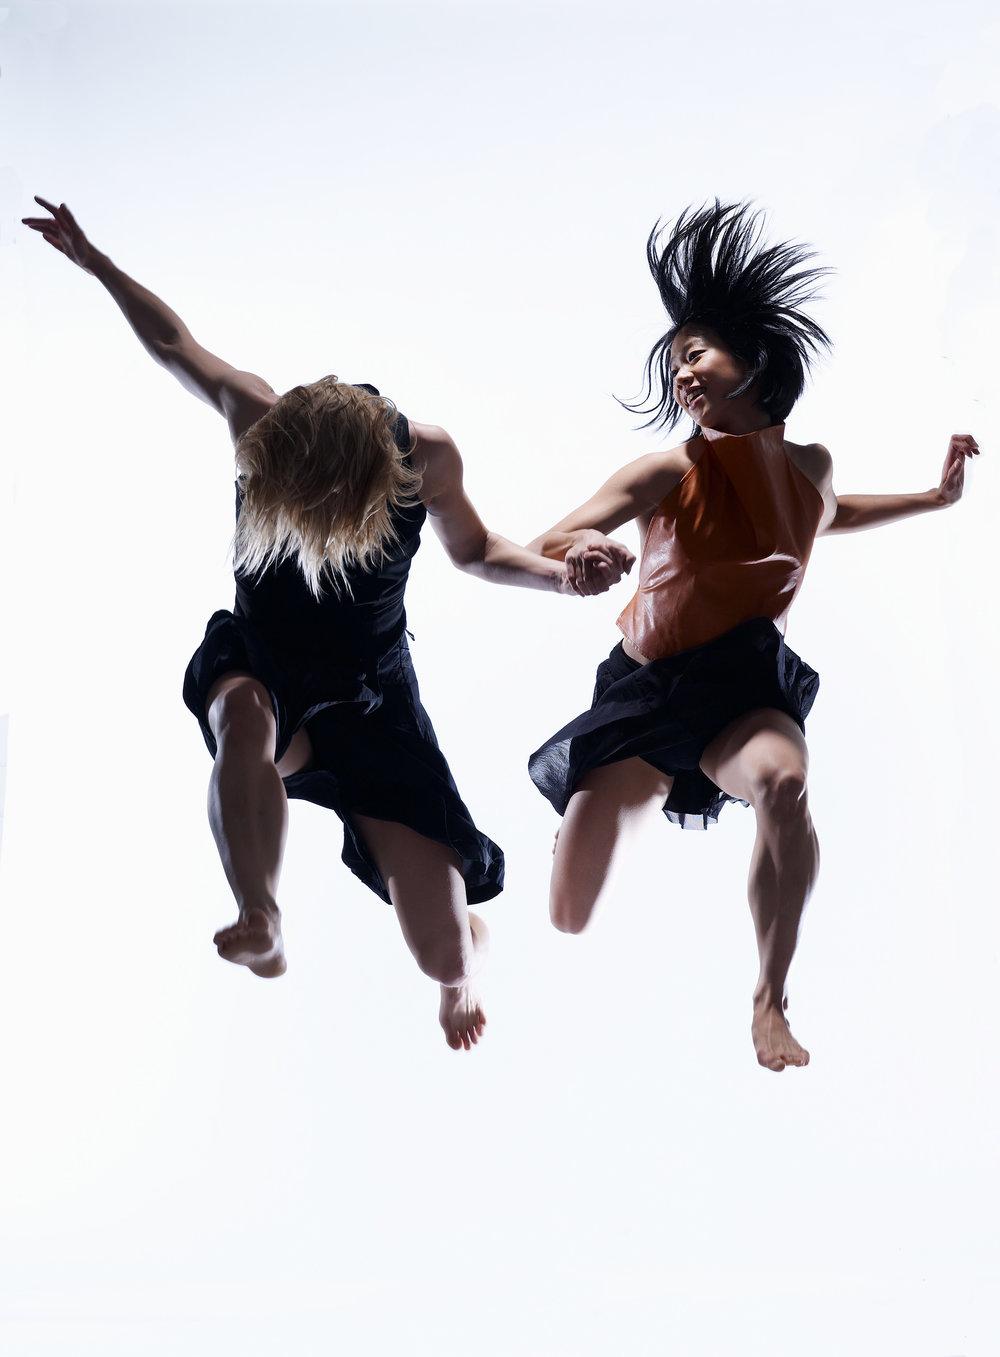 Bern_Ballet08_2-006229.jpg